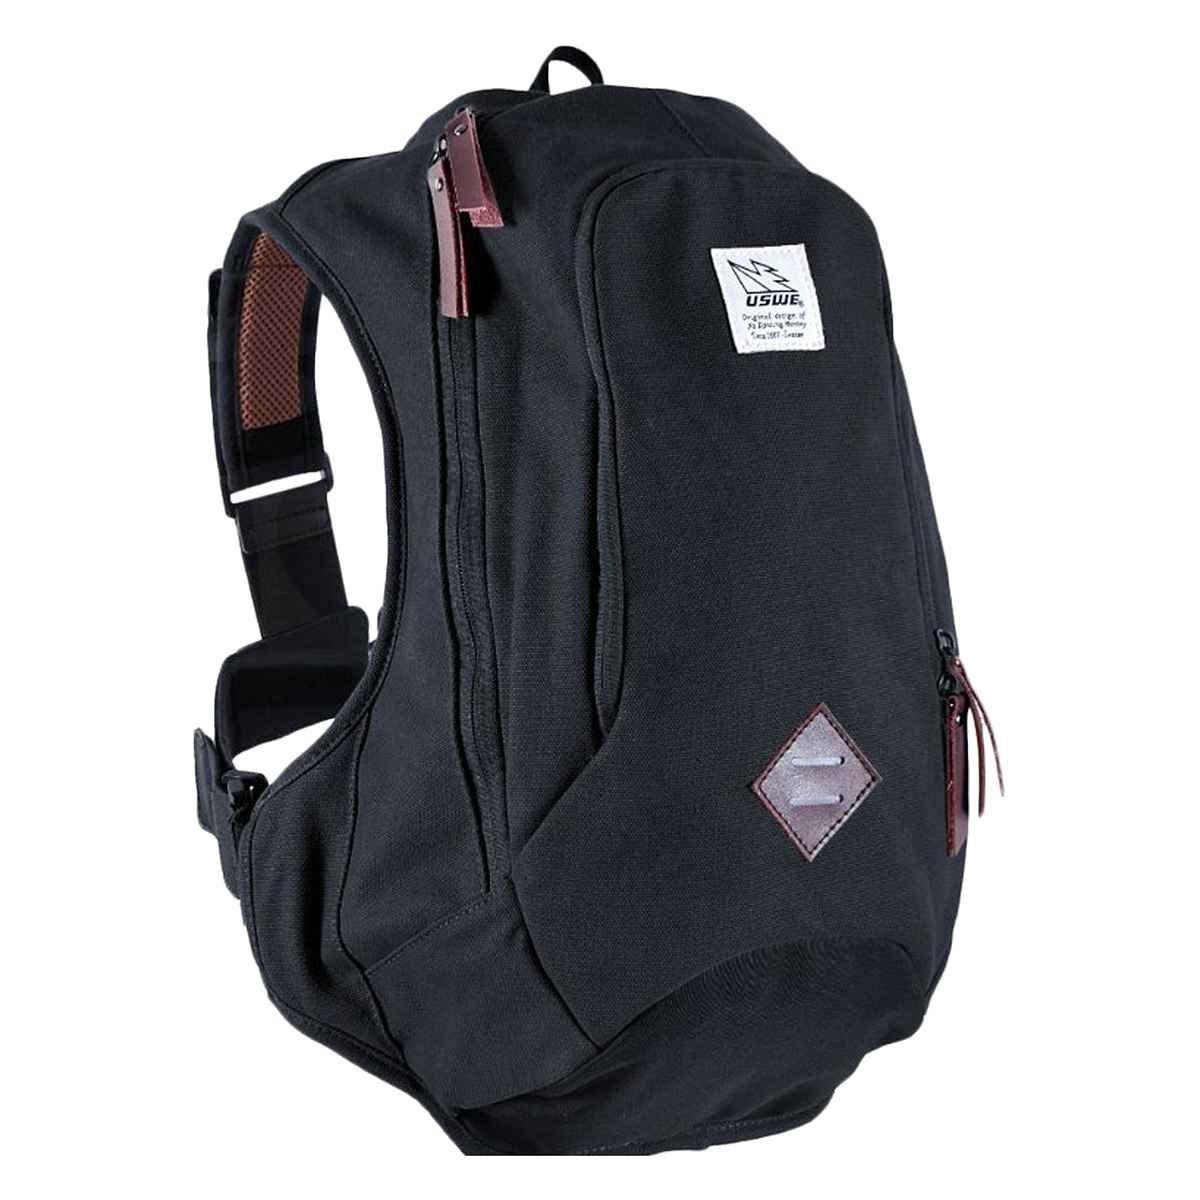 USWE Bag Uswe Hydration Scrambler-16 Black - K-2160411